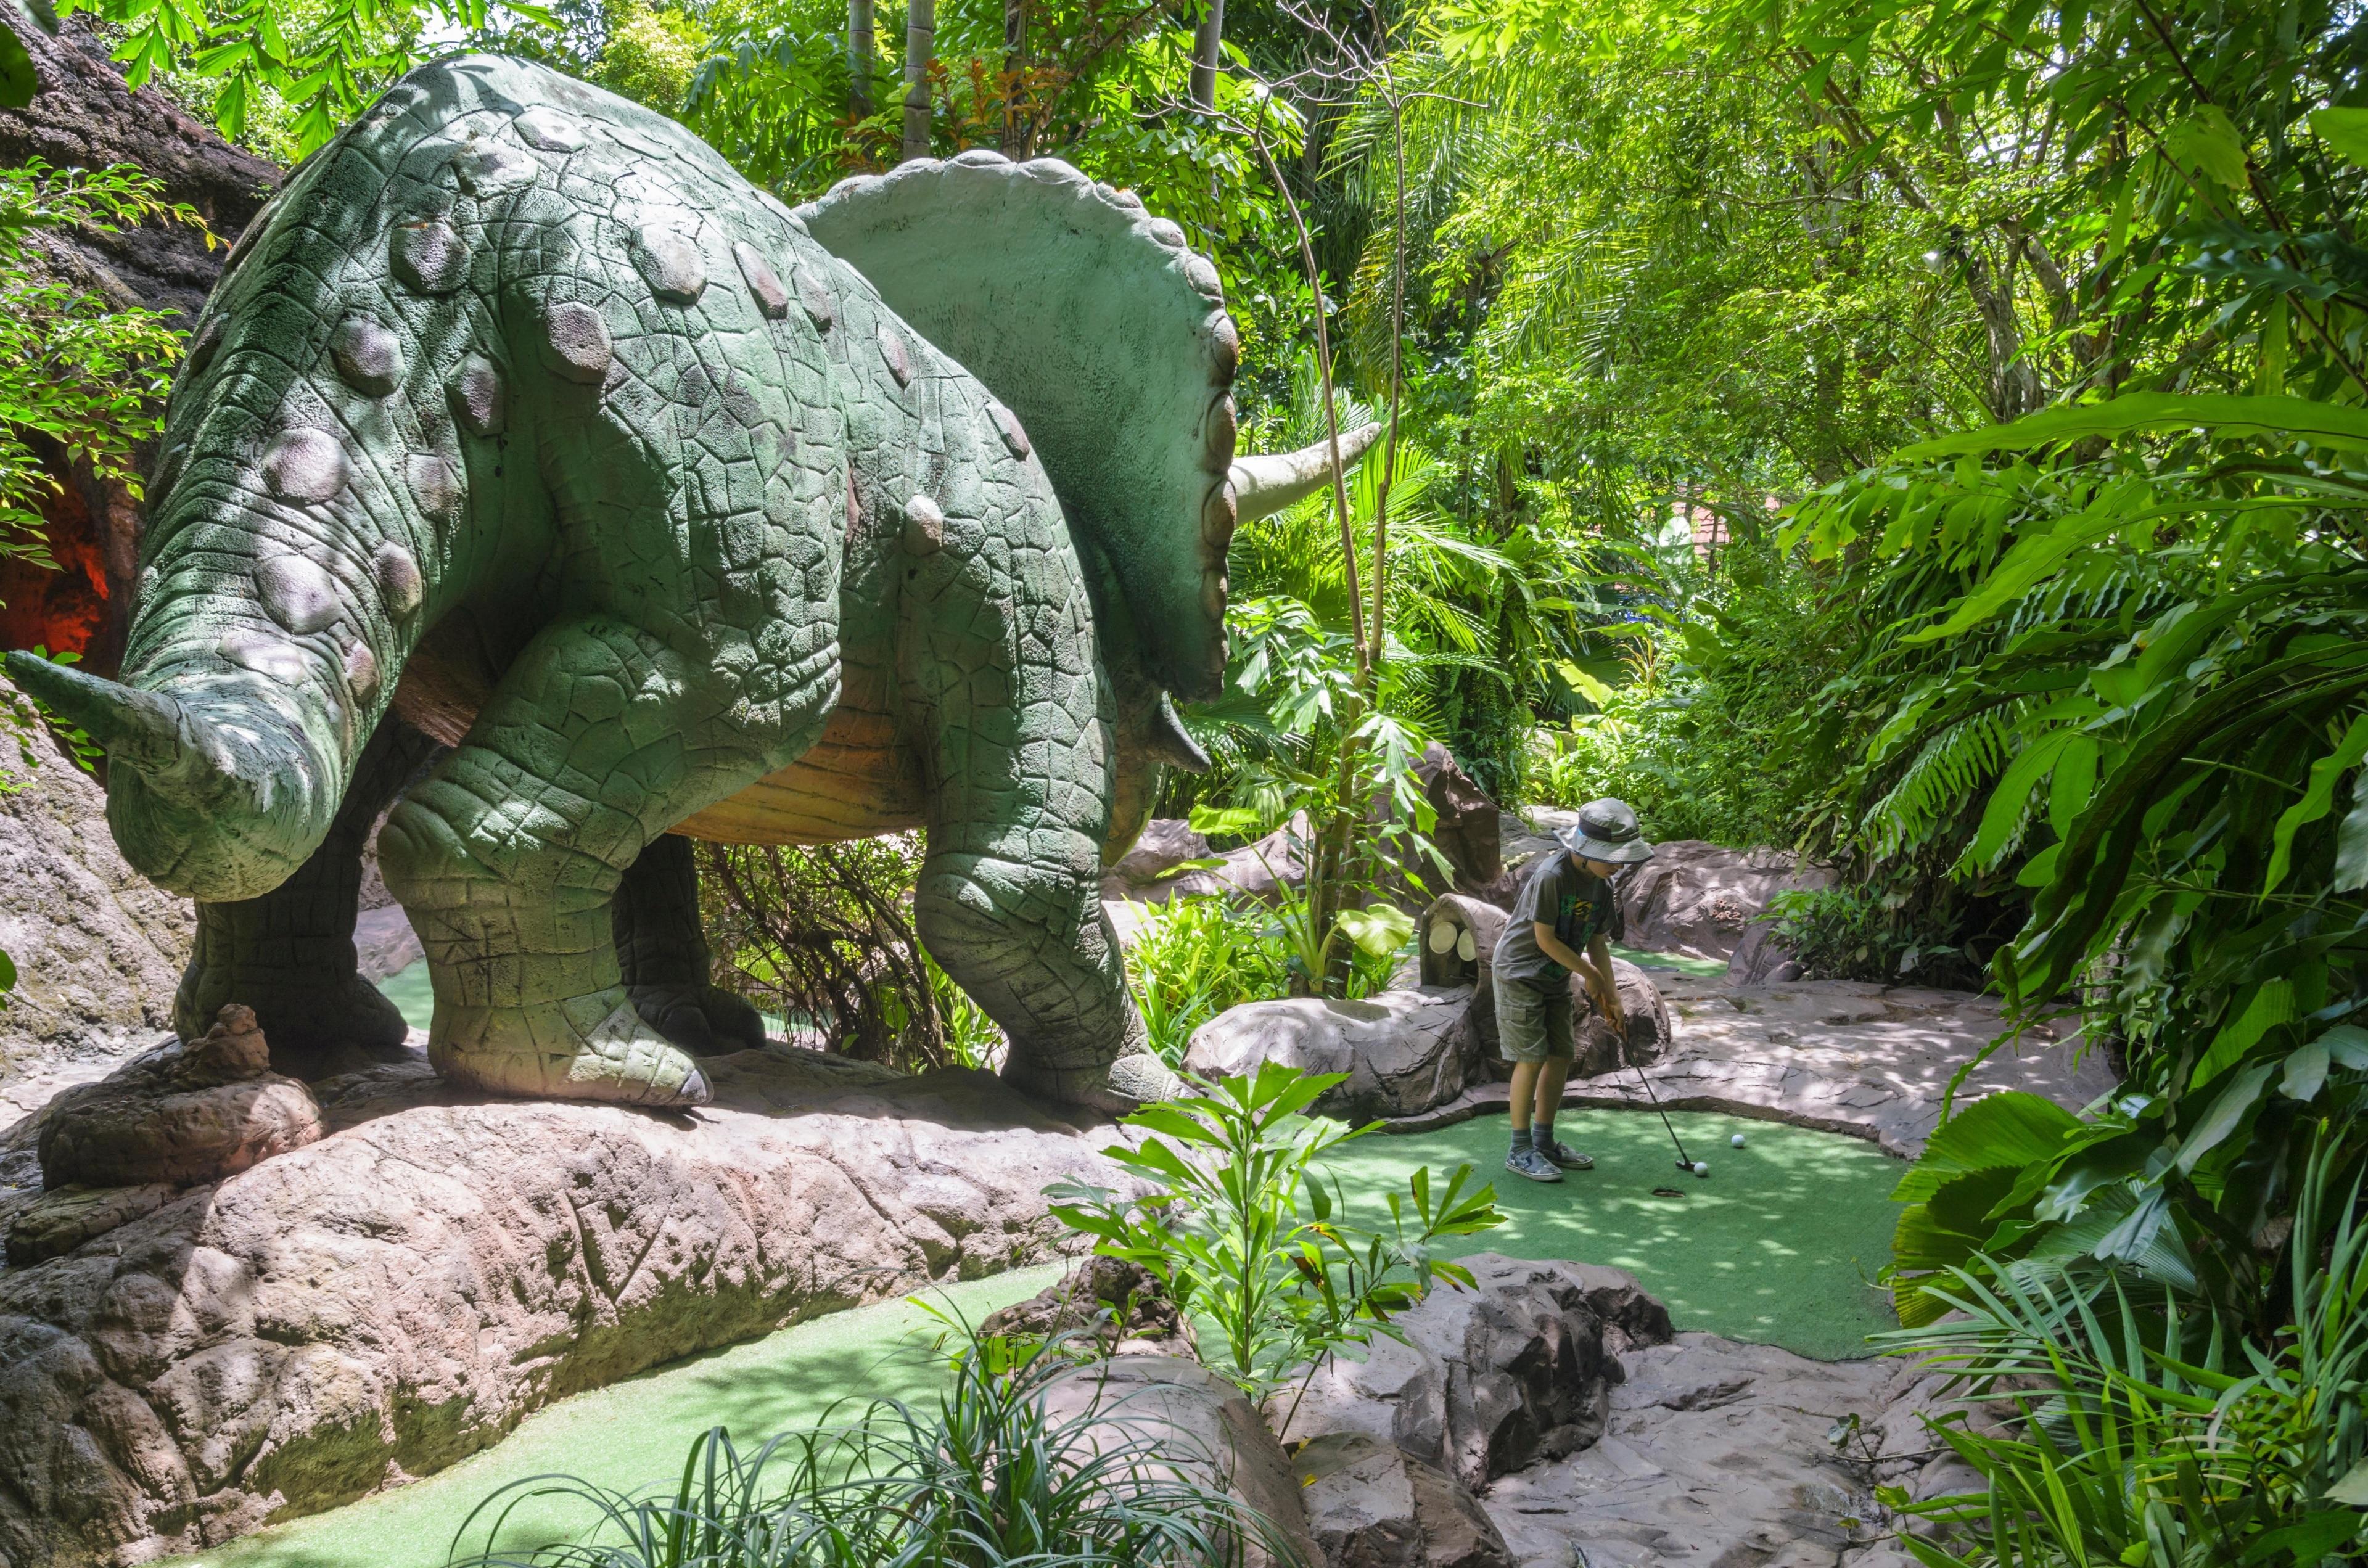 Dino Park Mini Golf, Karon, Phuket Province, Thailand